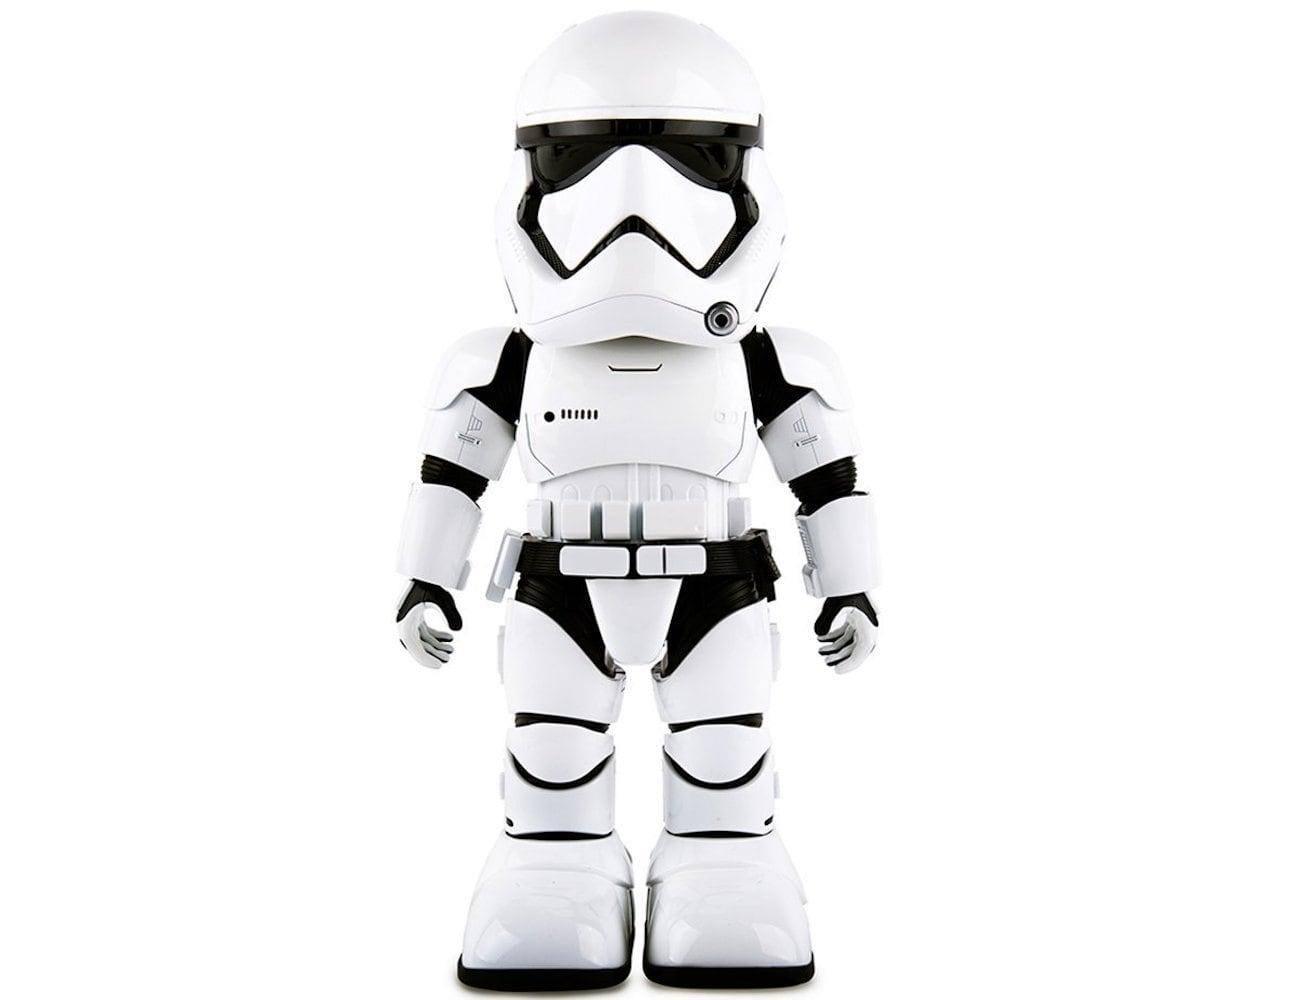 Star wars ar stormtrooper robot gadget flow - Robot blanc star wars ...